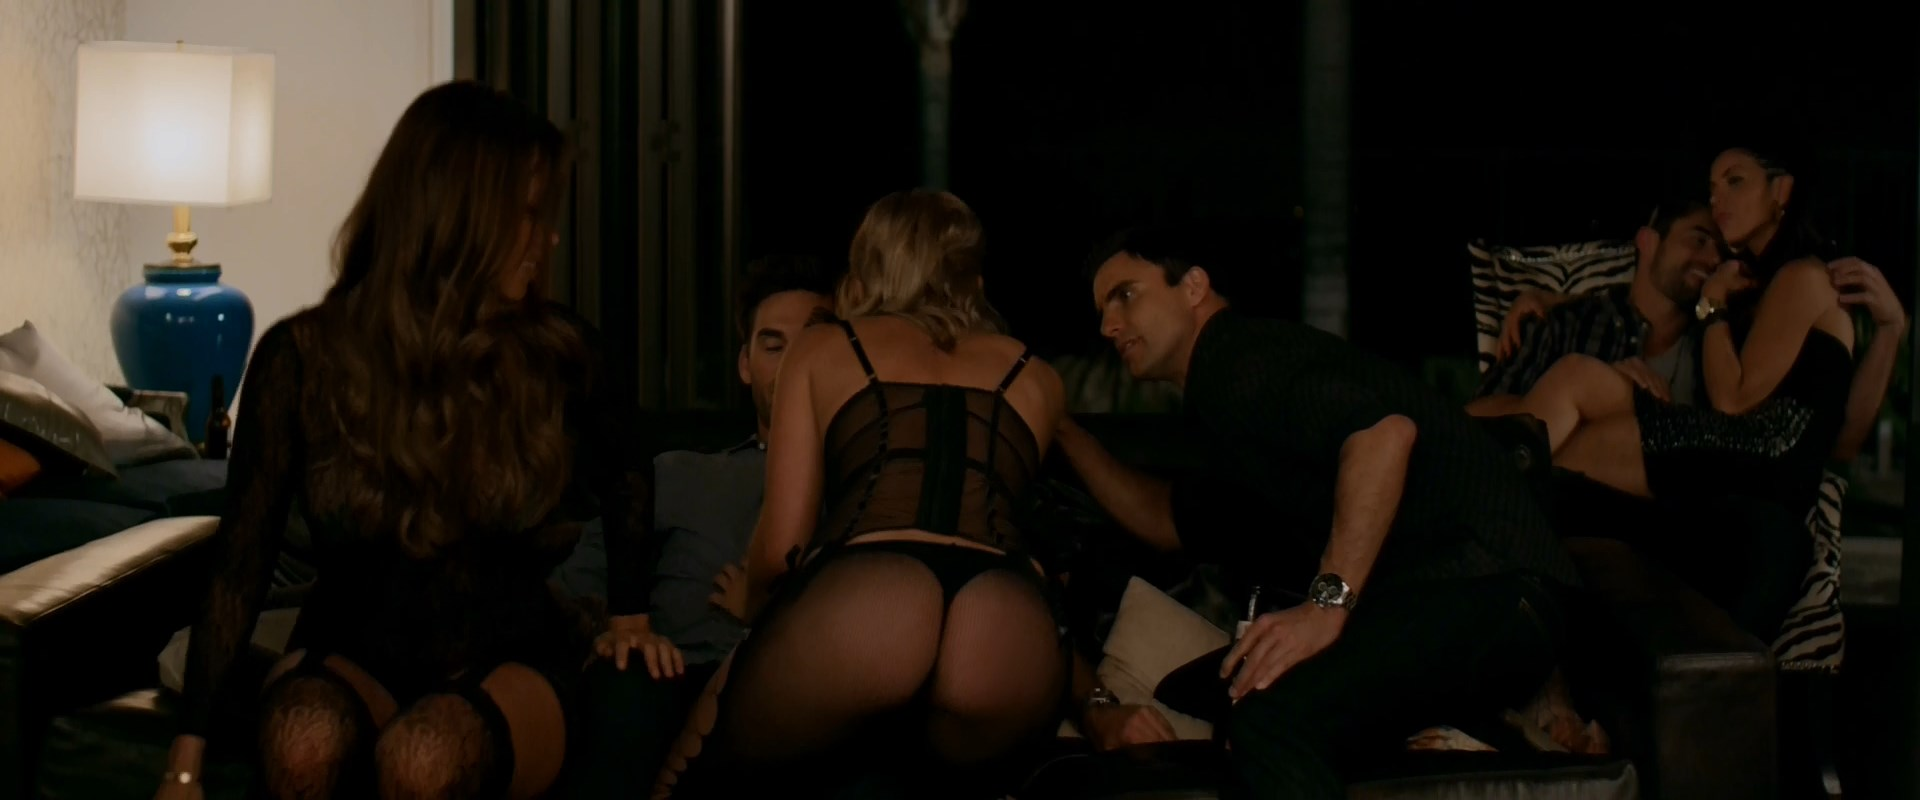 Caesar  nackt Jessica A. Video shows